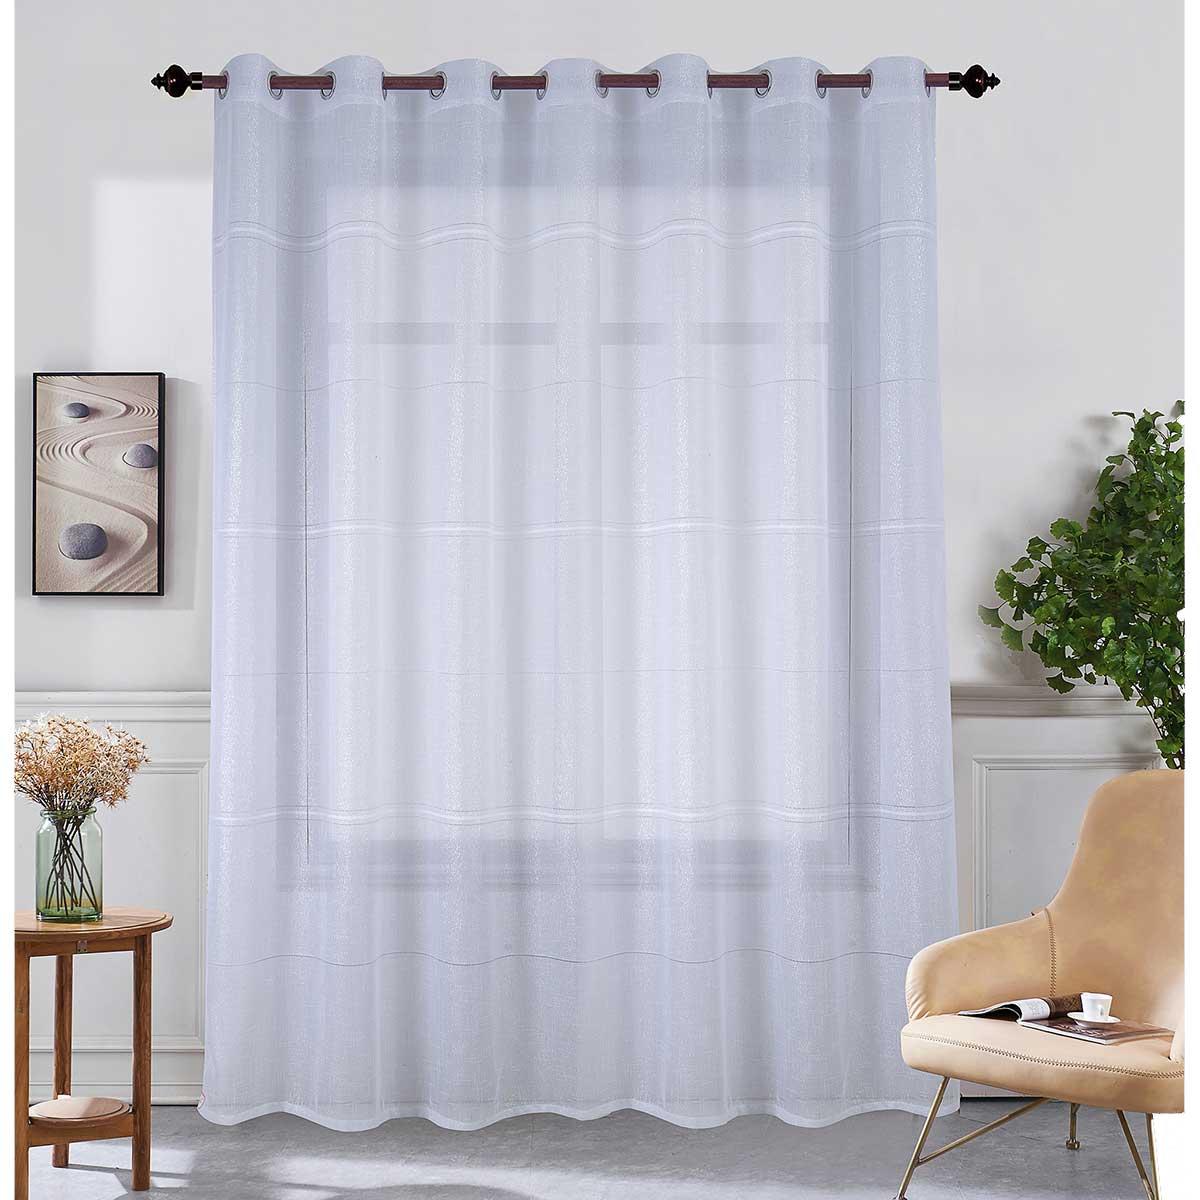 voilage grande largeur brillant blanc bordeaux gris. Black Bedroom Furniture Sets. Home Design Ideas